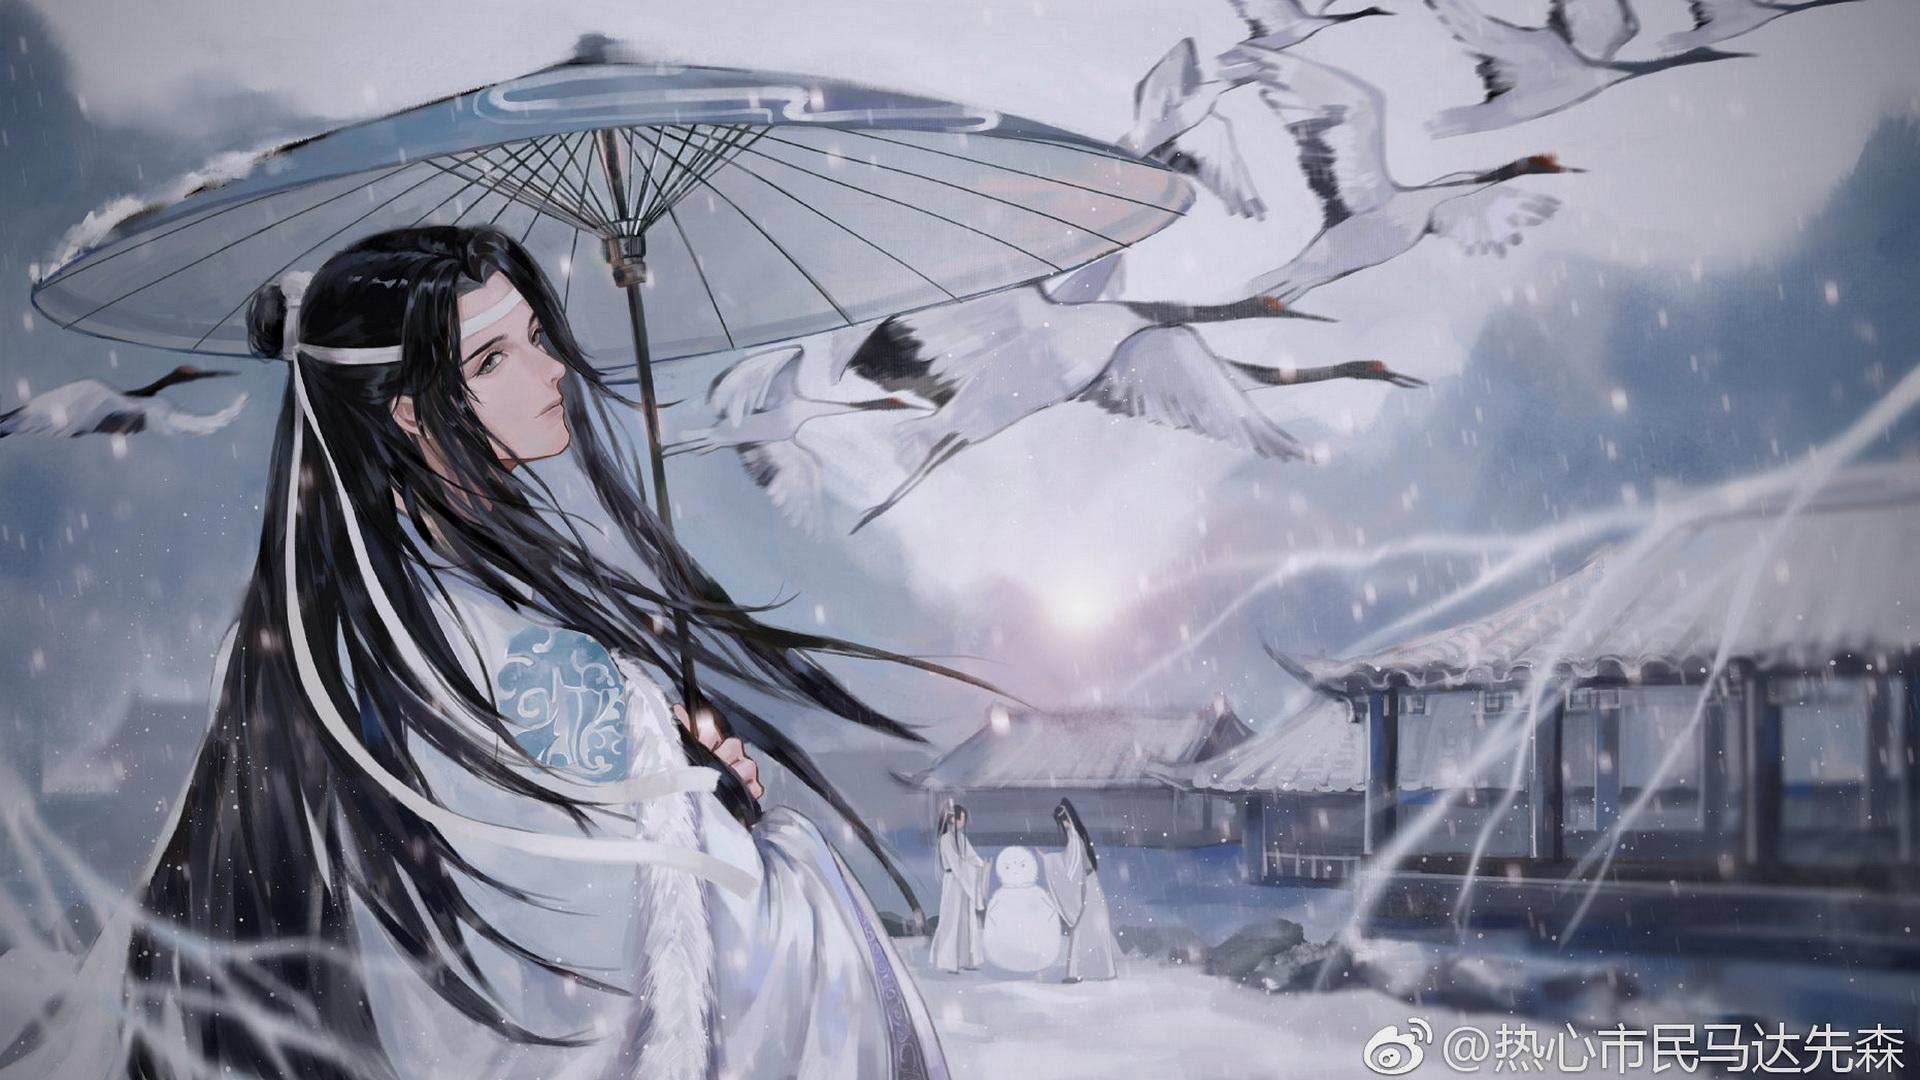 Lan Wangji Lan Zhan 1920x1080